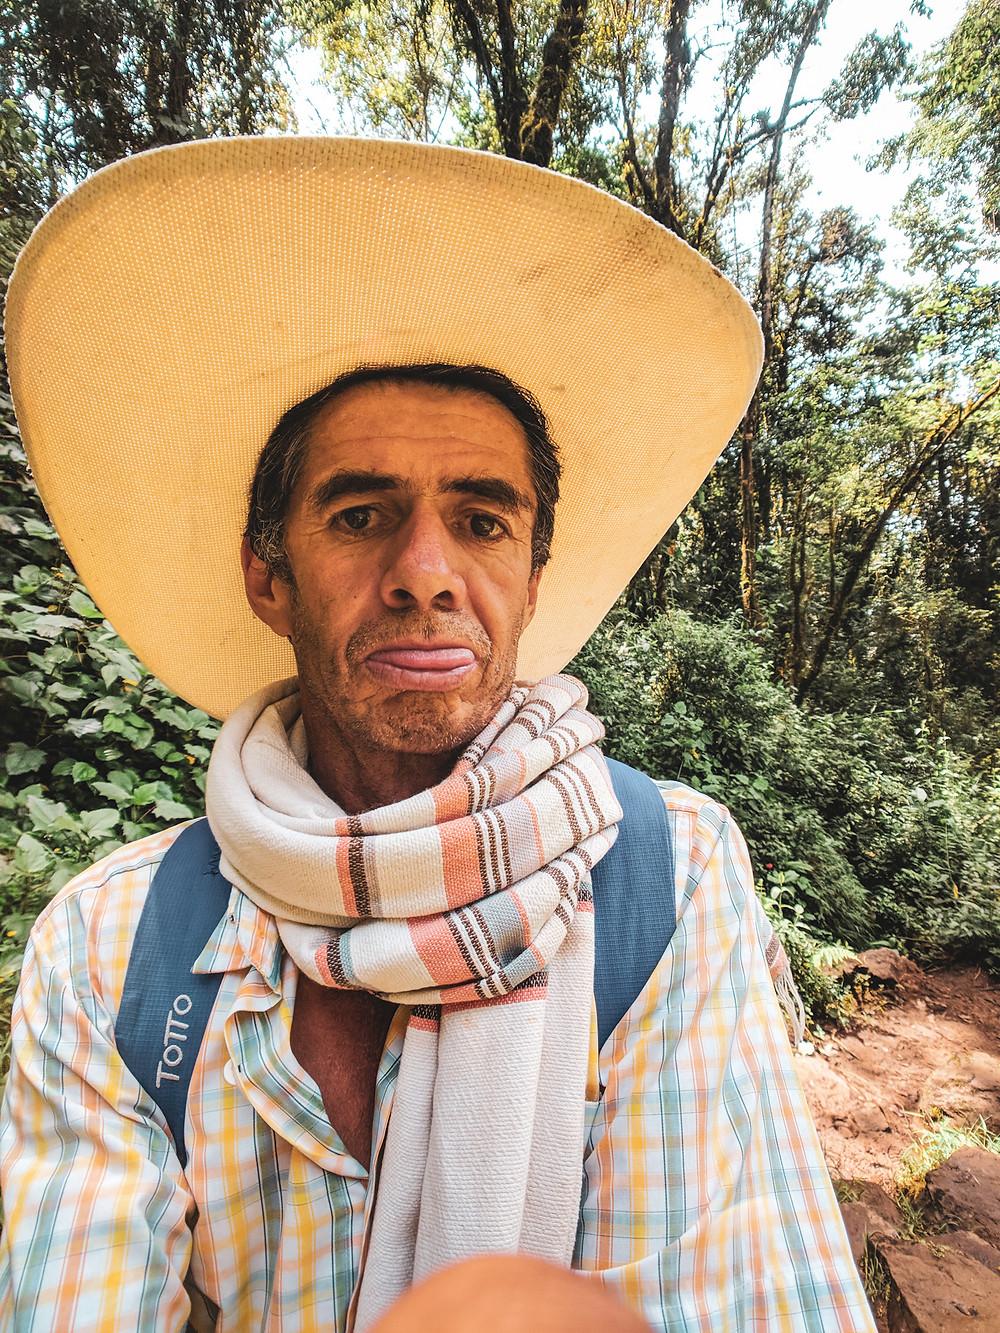 Cowboy in Jardin, Colombia.